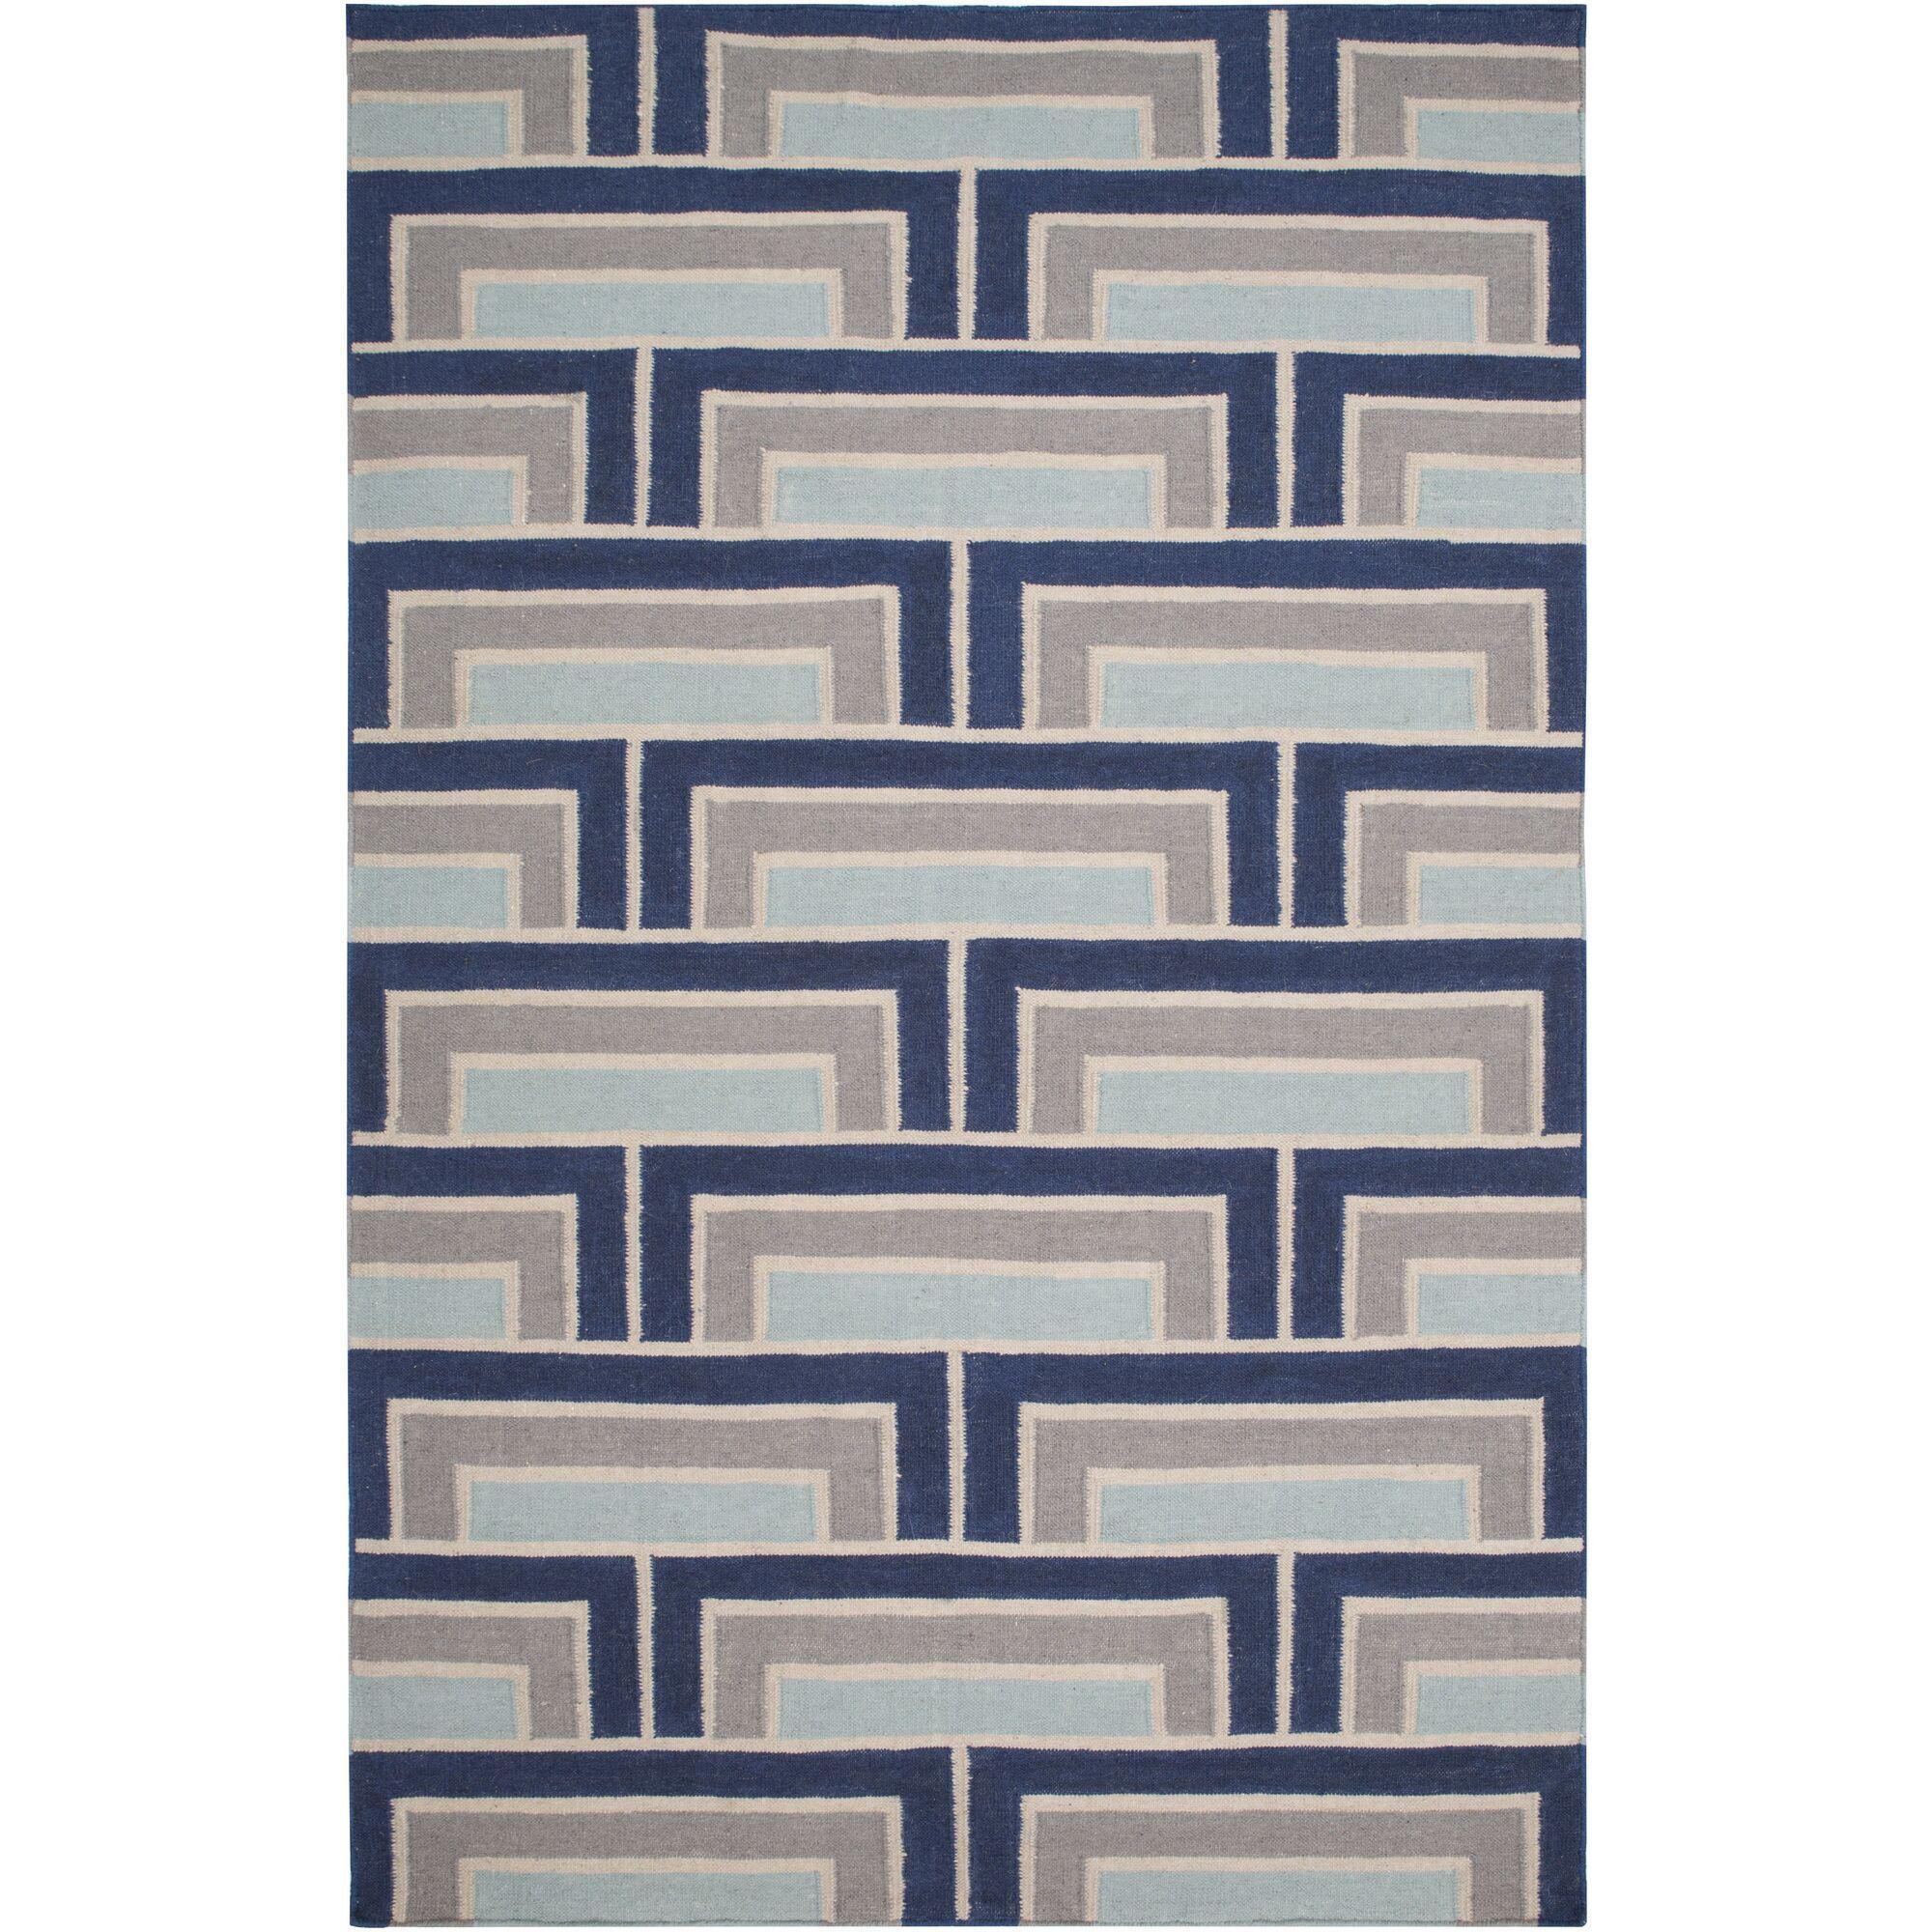 Paddington Navy/Light Gray Geometric Area Rug Rug Size: 2' x 3'